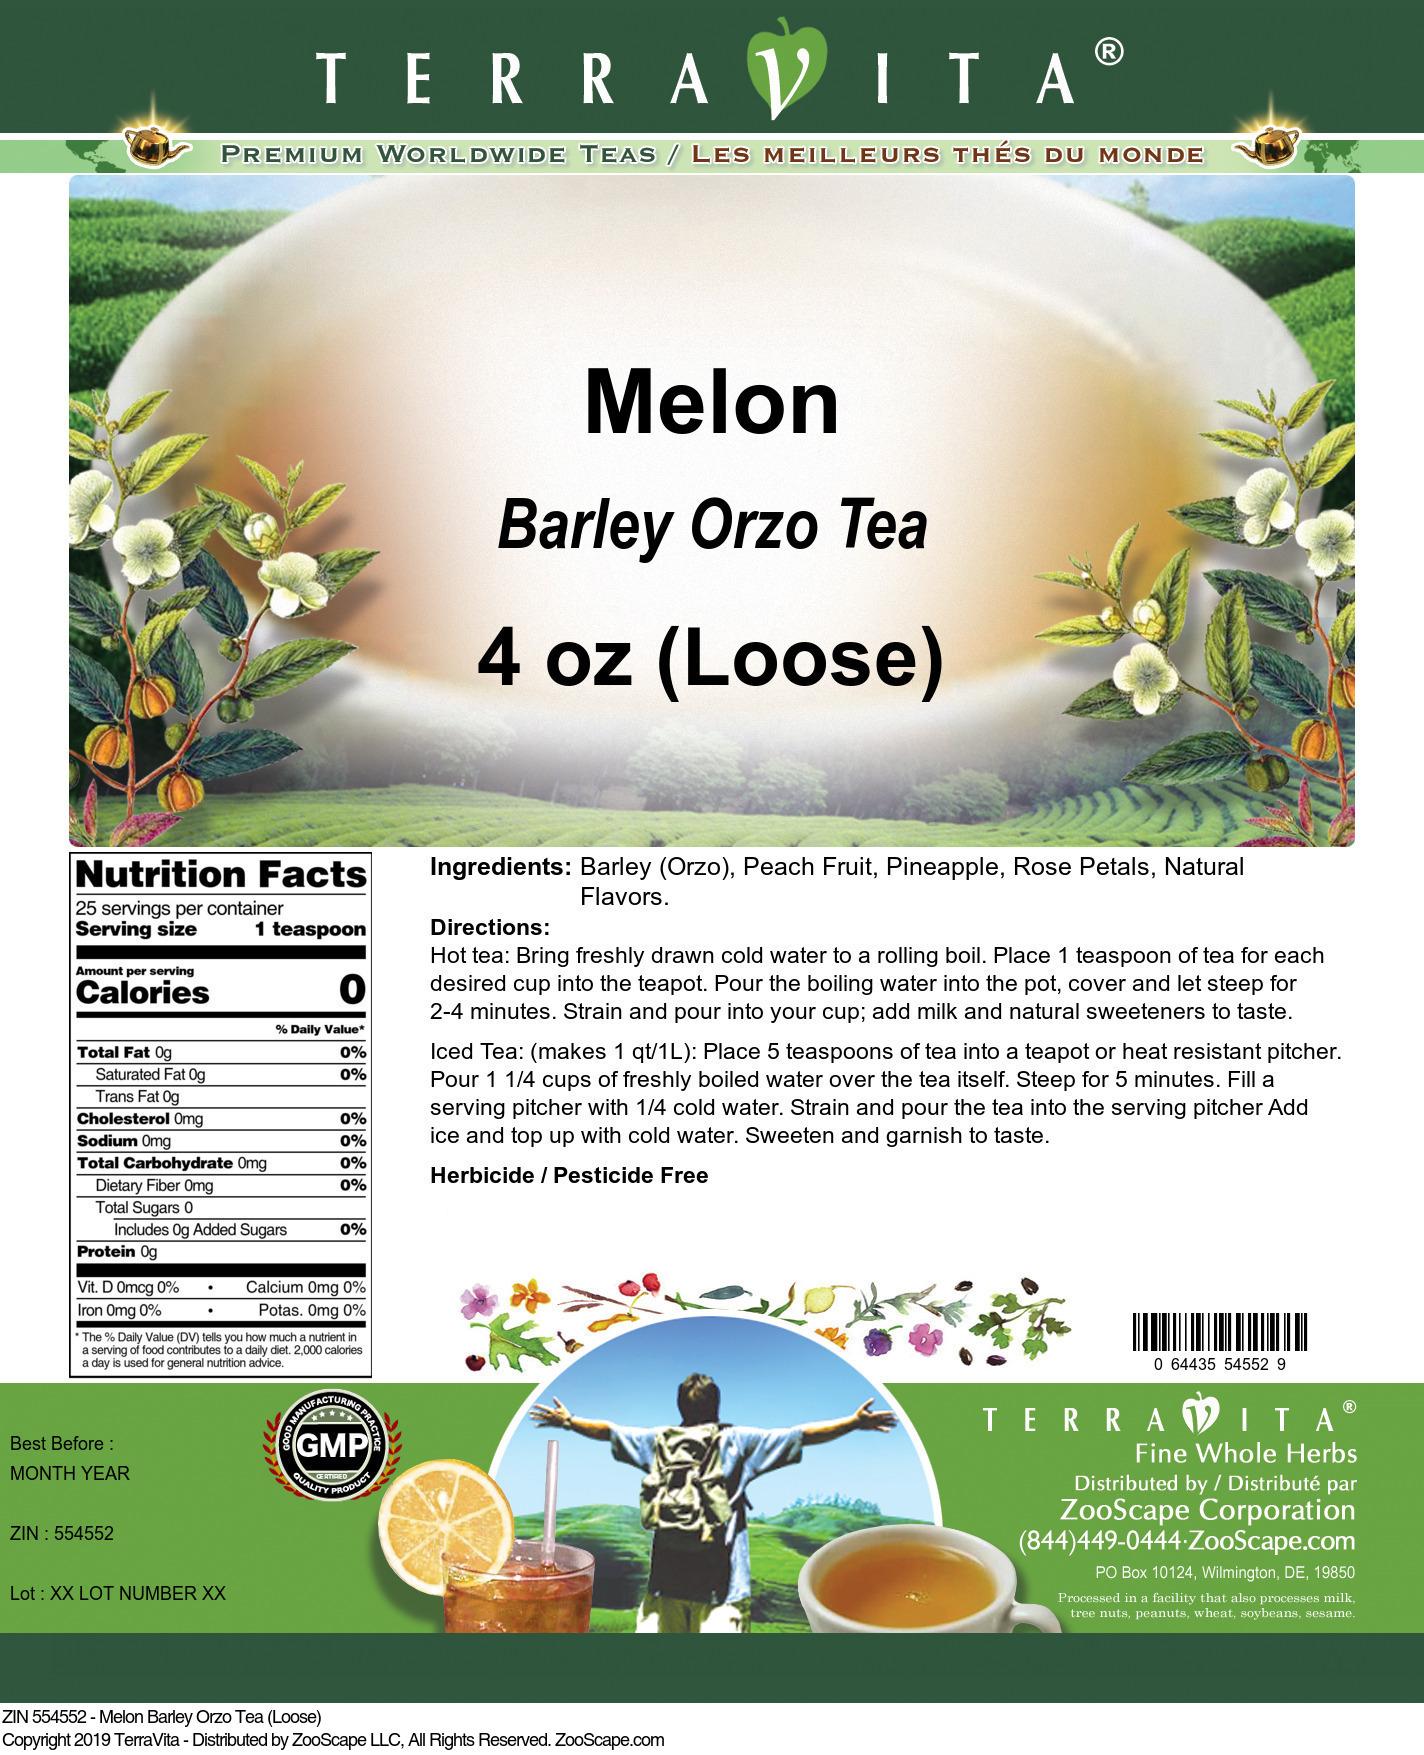 Melon Barley Orzo